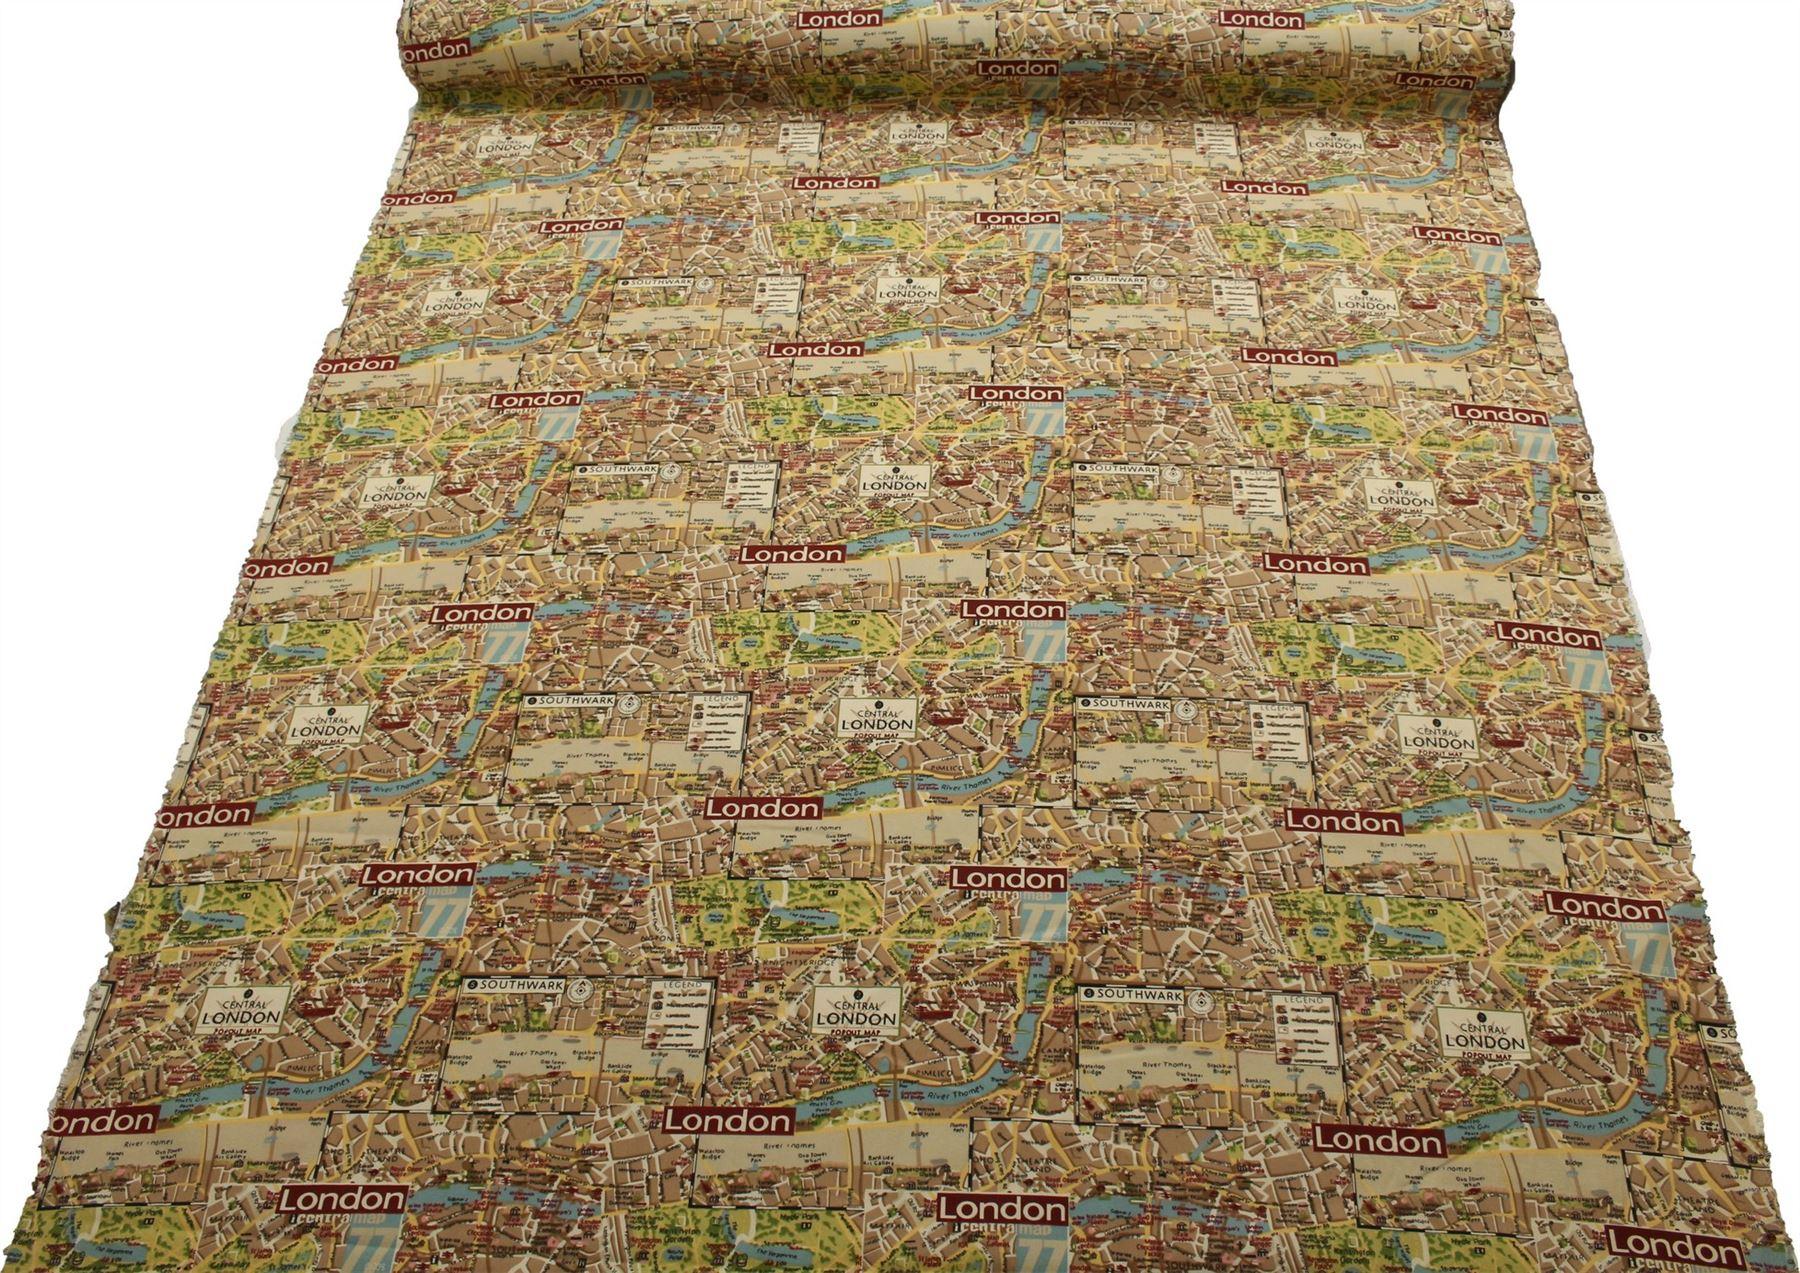 thumbnail 74 - 100% Heavy Cotton Panama Printed Childrens Curtain Cushion Upholstery Fabric